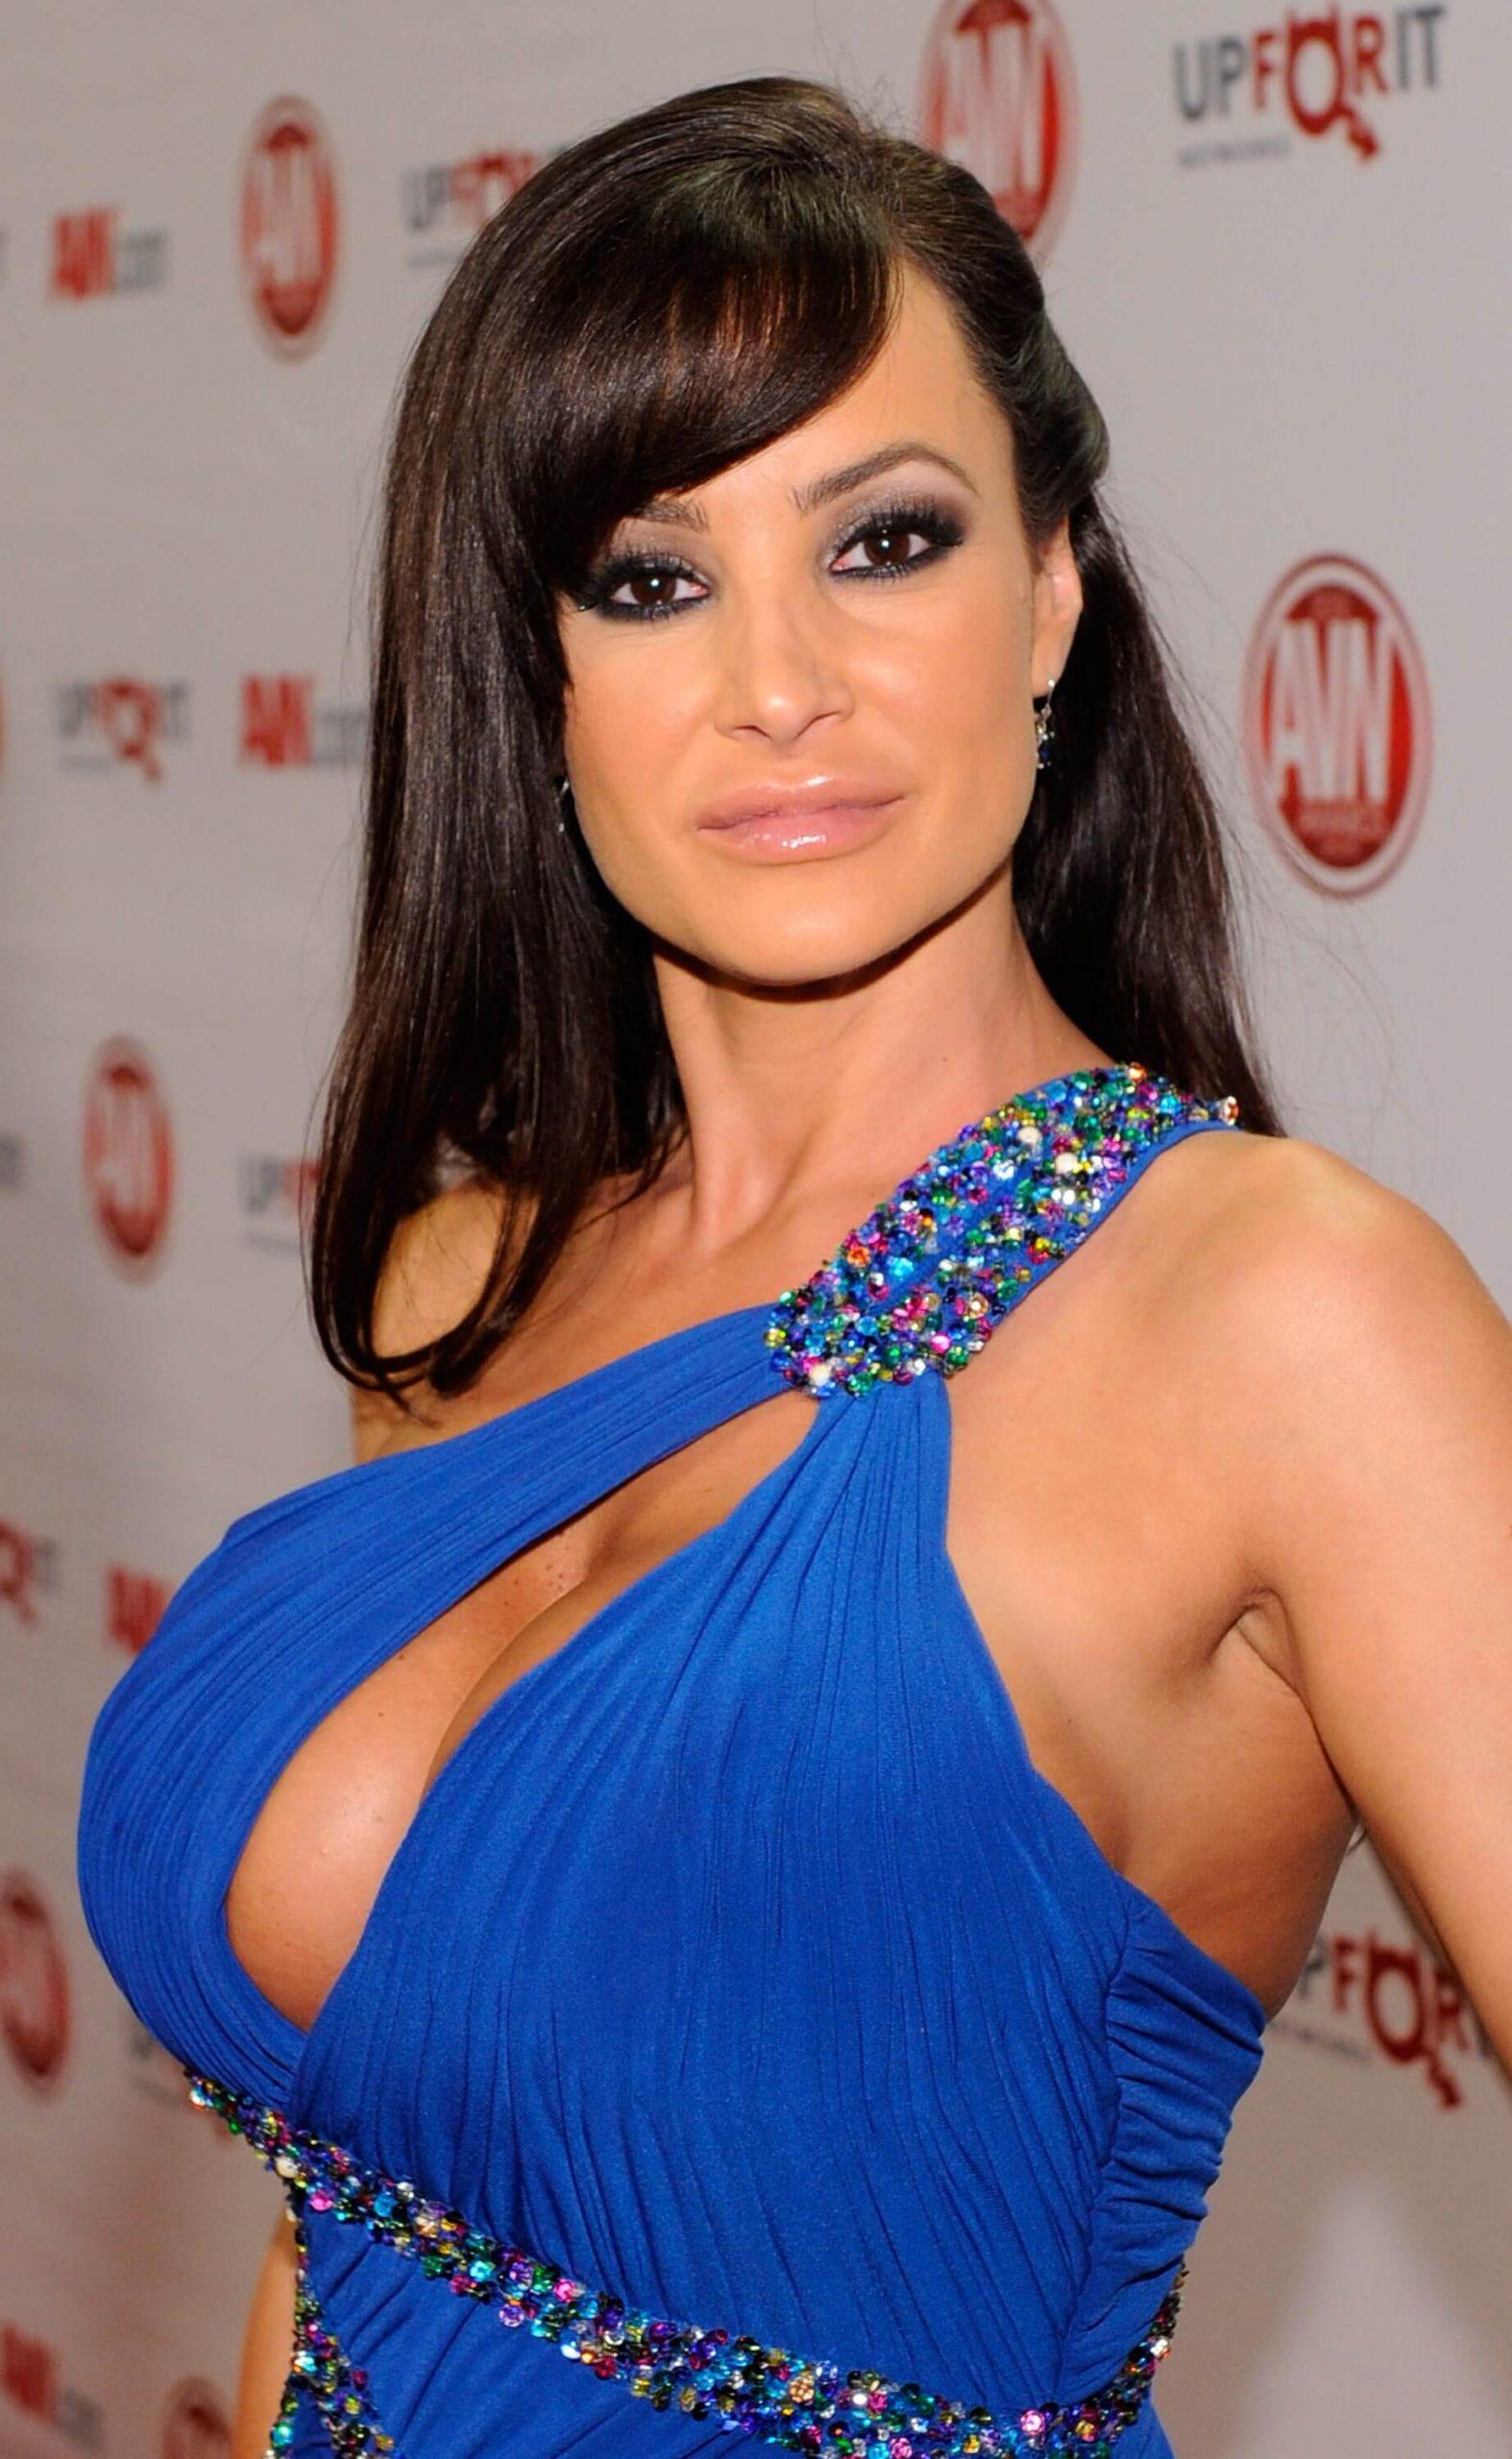 Lisa Ann Blue Dress